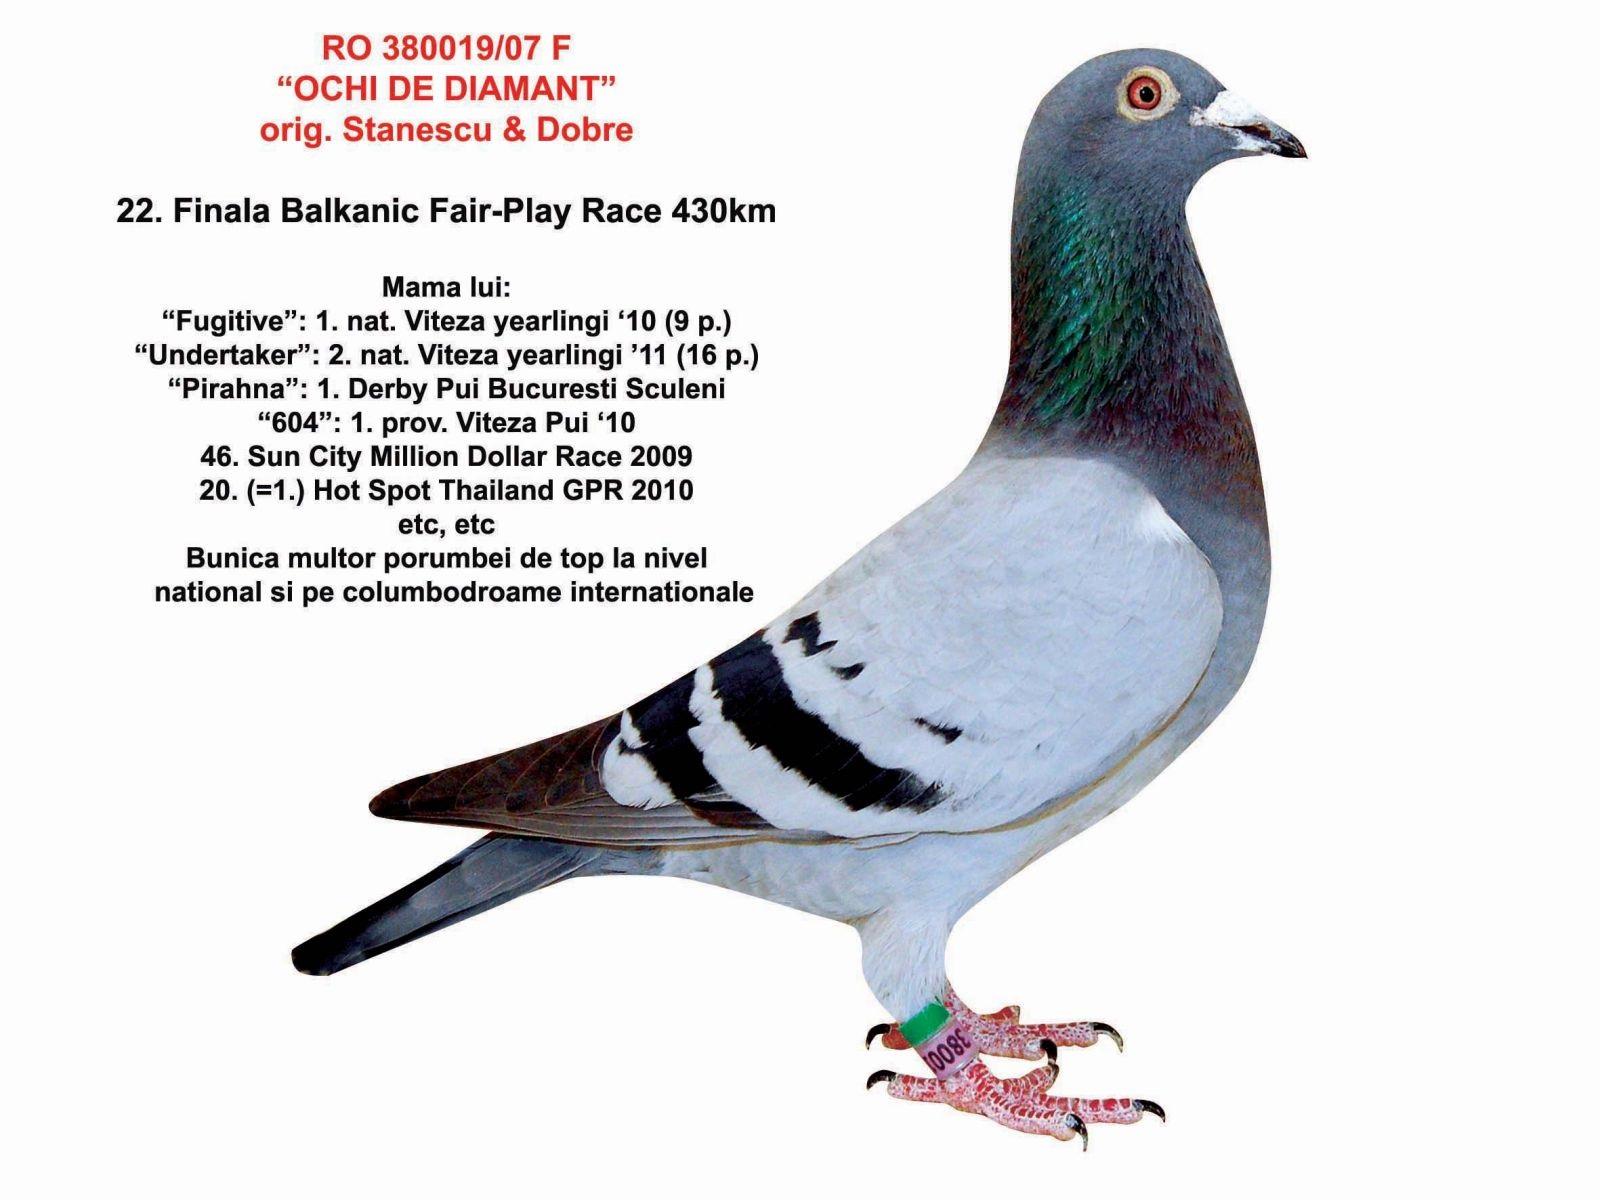 RO13-0973620 ERKEK /  ORJ BIBI STEFANESCU BABASI 1. SEMI FINAL ANNESI 22. BFP RACE